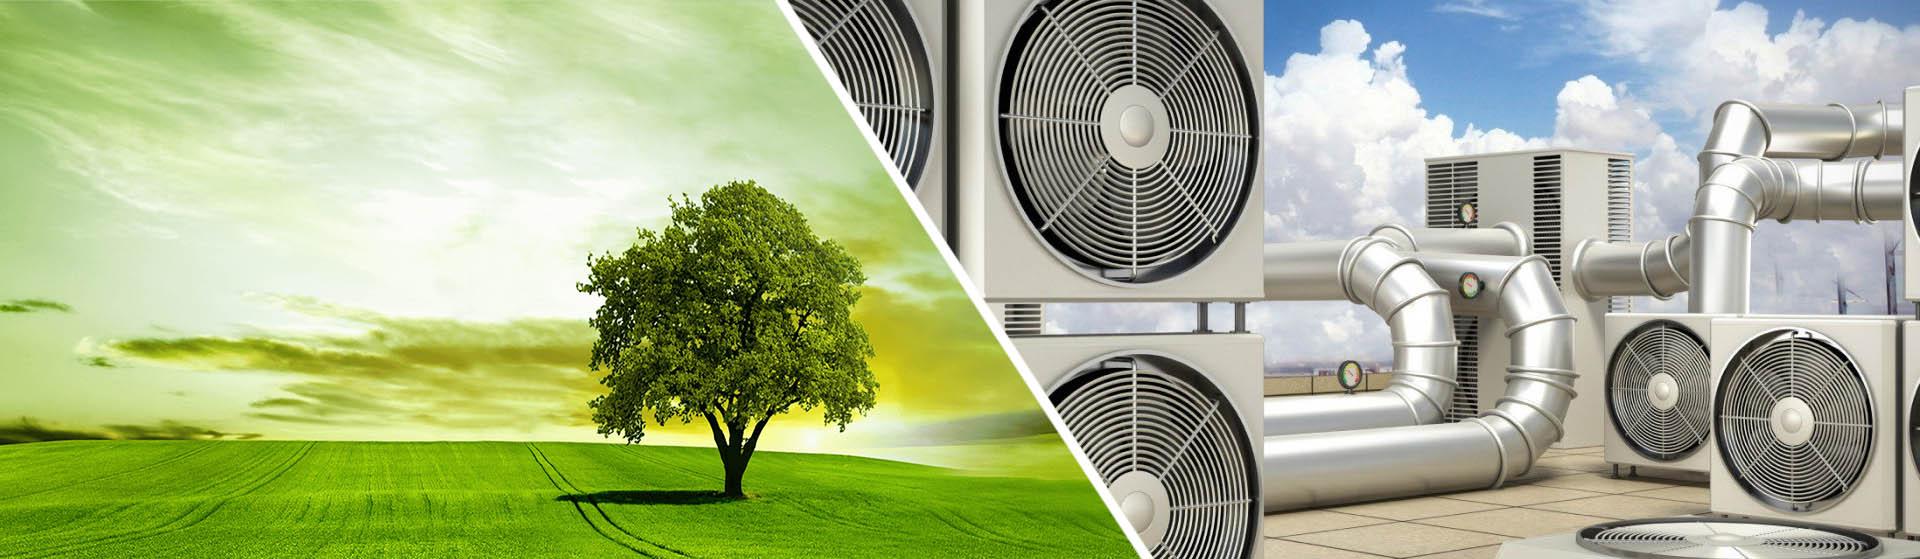 Service si instalatii profesionale aer contitionat pentru casa si comercial